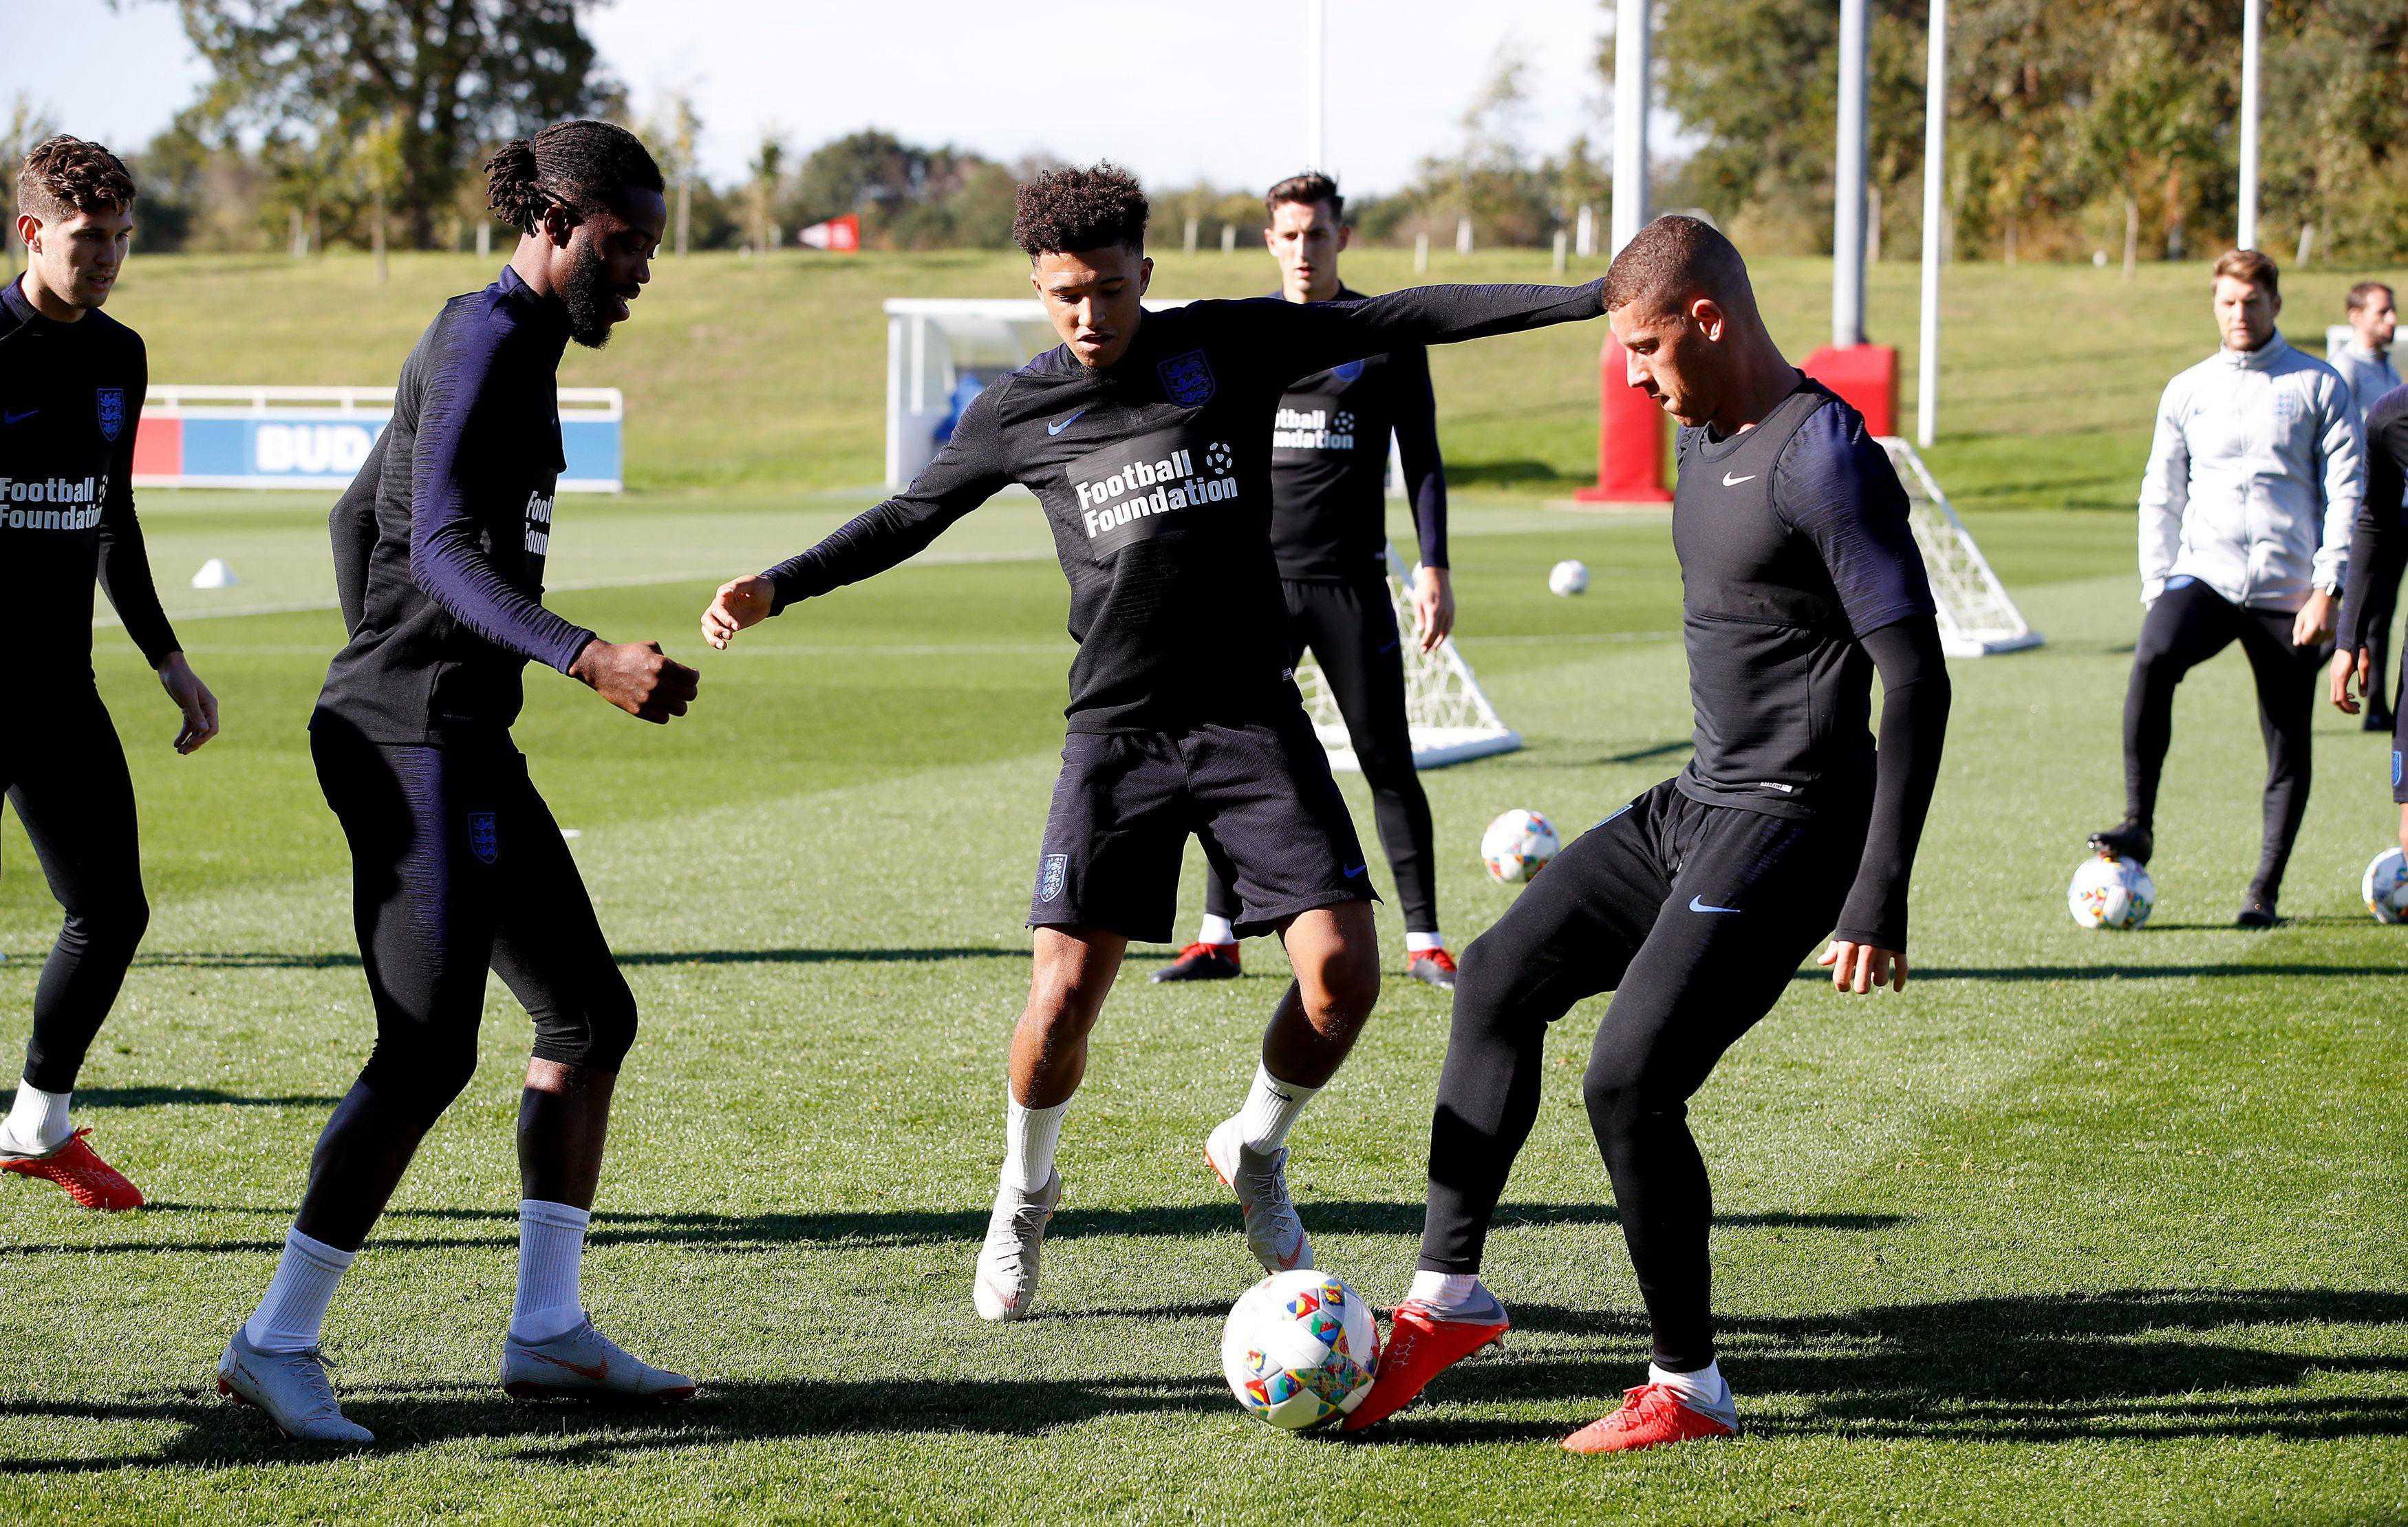 Scooper Football News Where S Jesse England Mock Rashford Over Lingard Bromance As He Arrives For Training